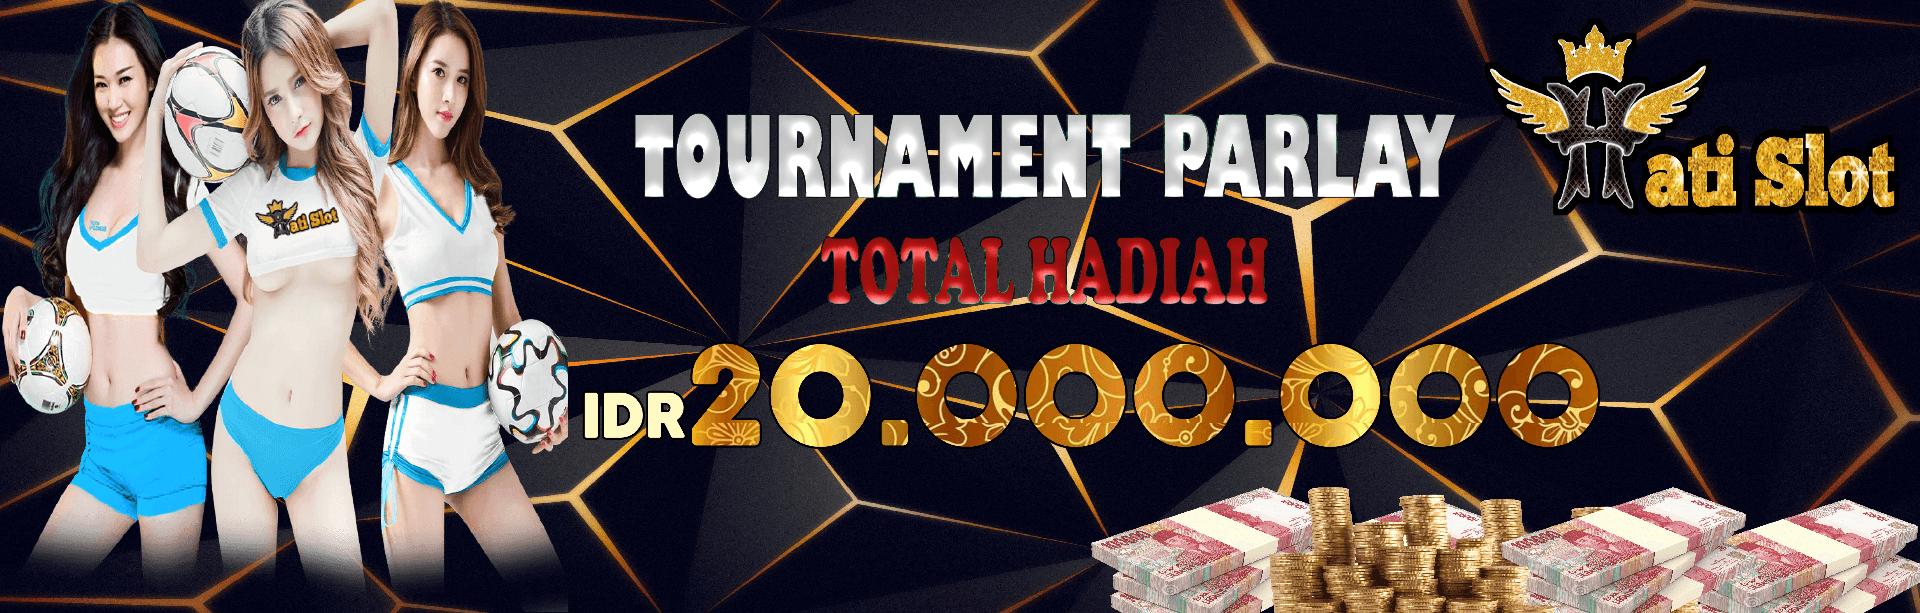 Tournament Parlay